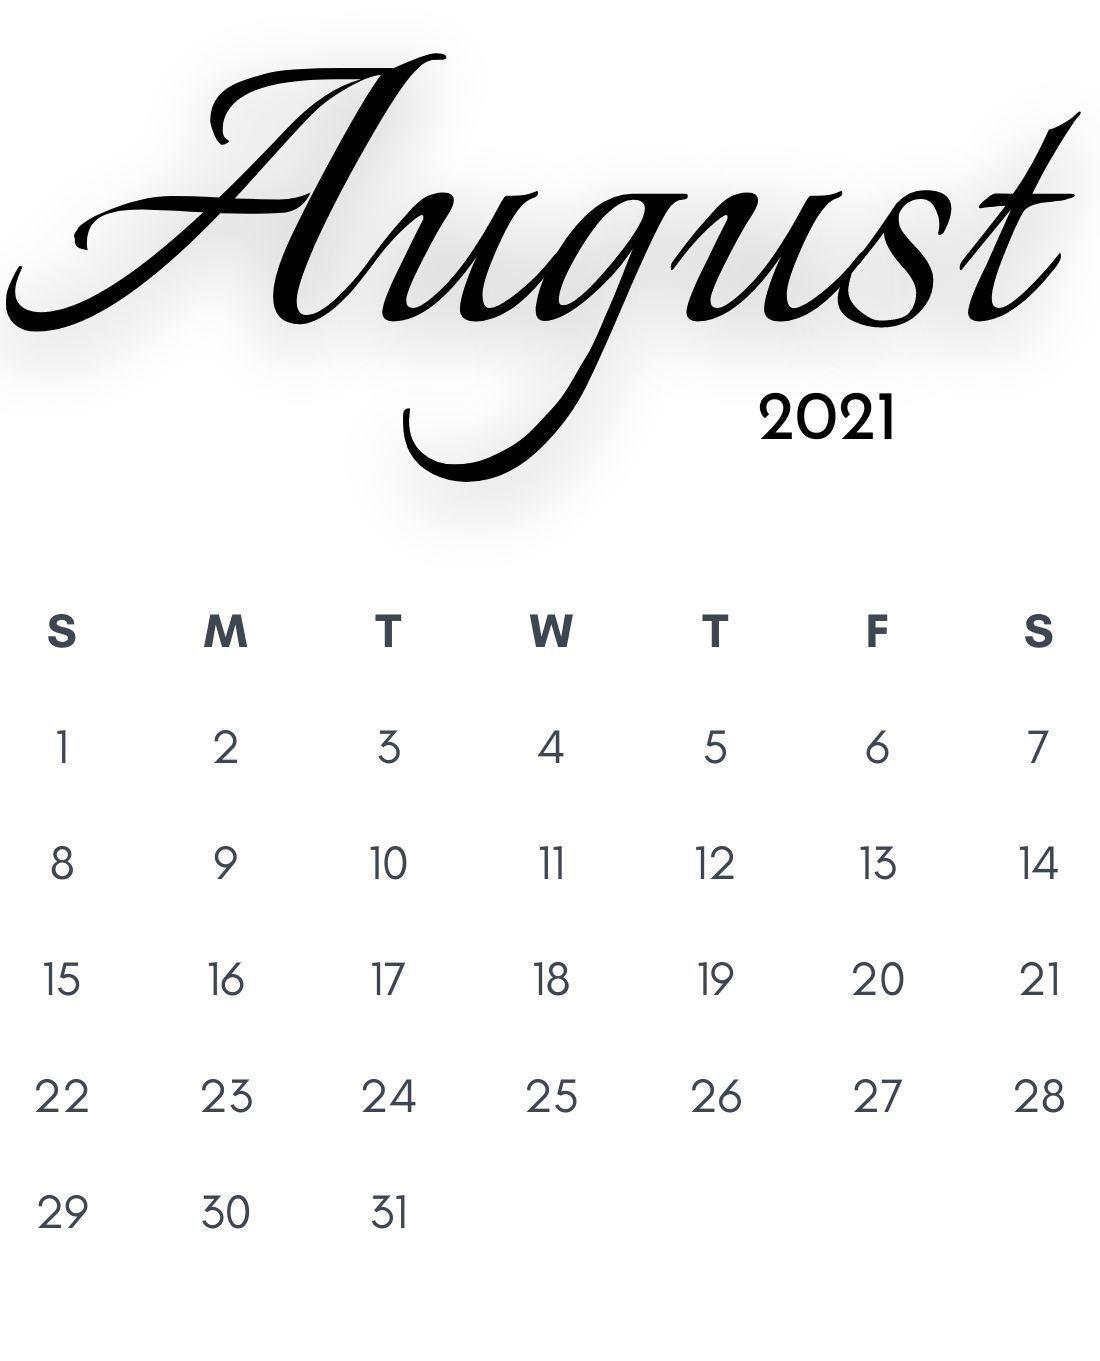 August 2021 iPhone Calendar